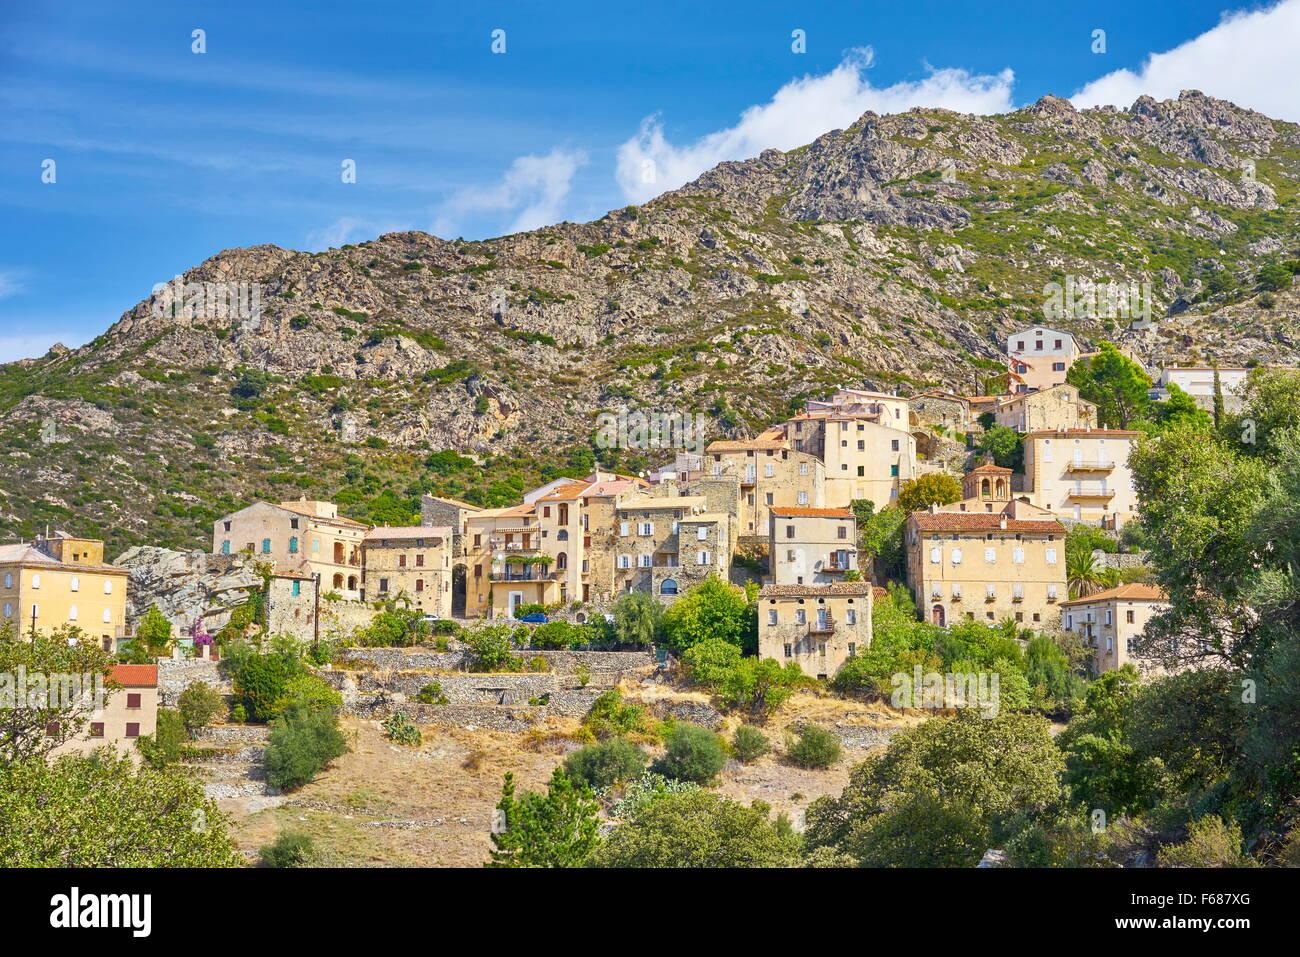 Small mountain village Lama, Balagne, West Coast, Corsica Island, France - Stock Image